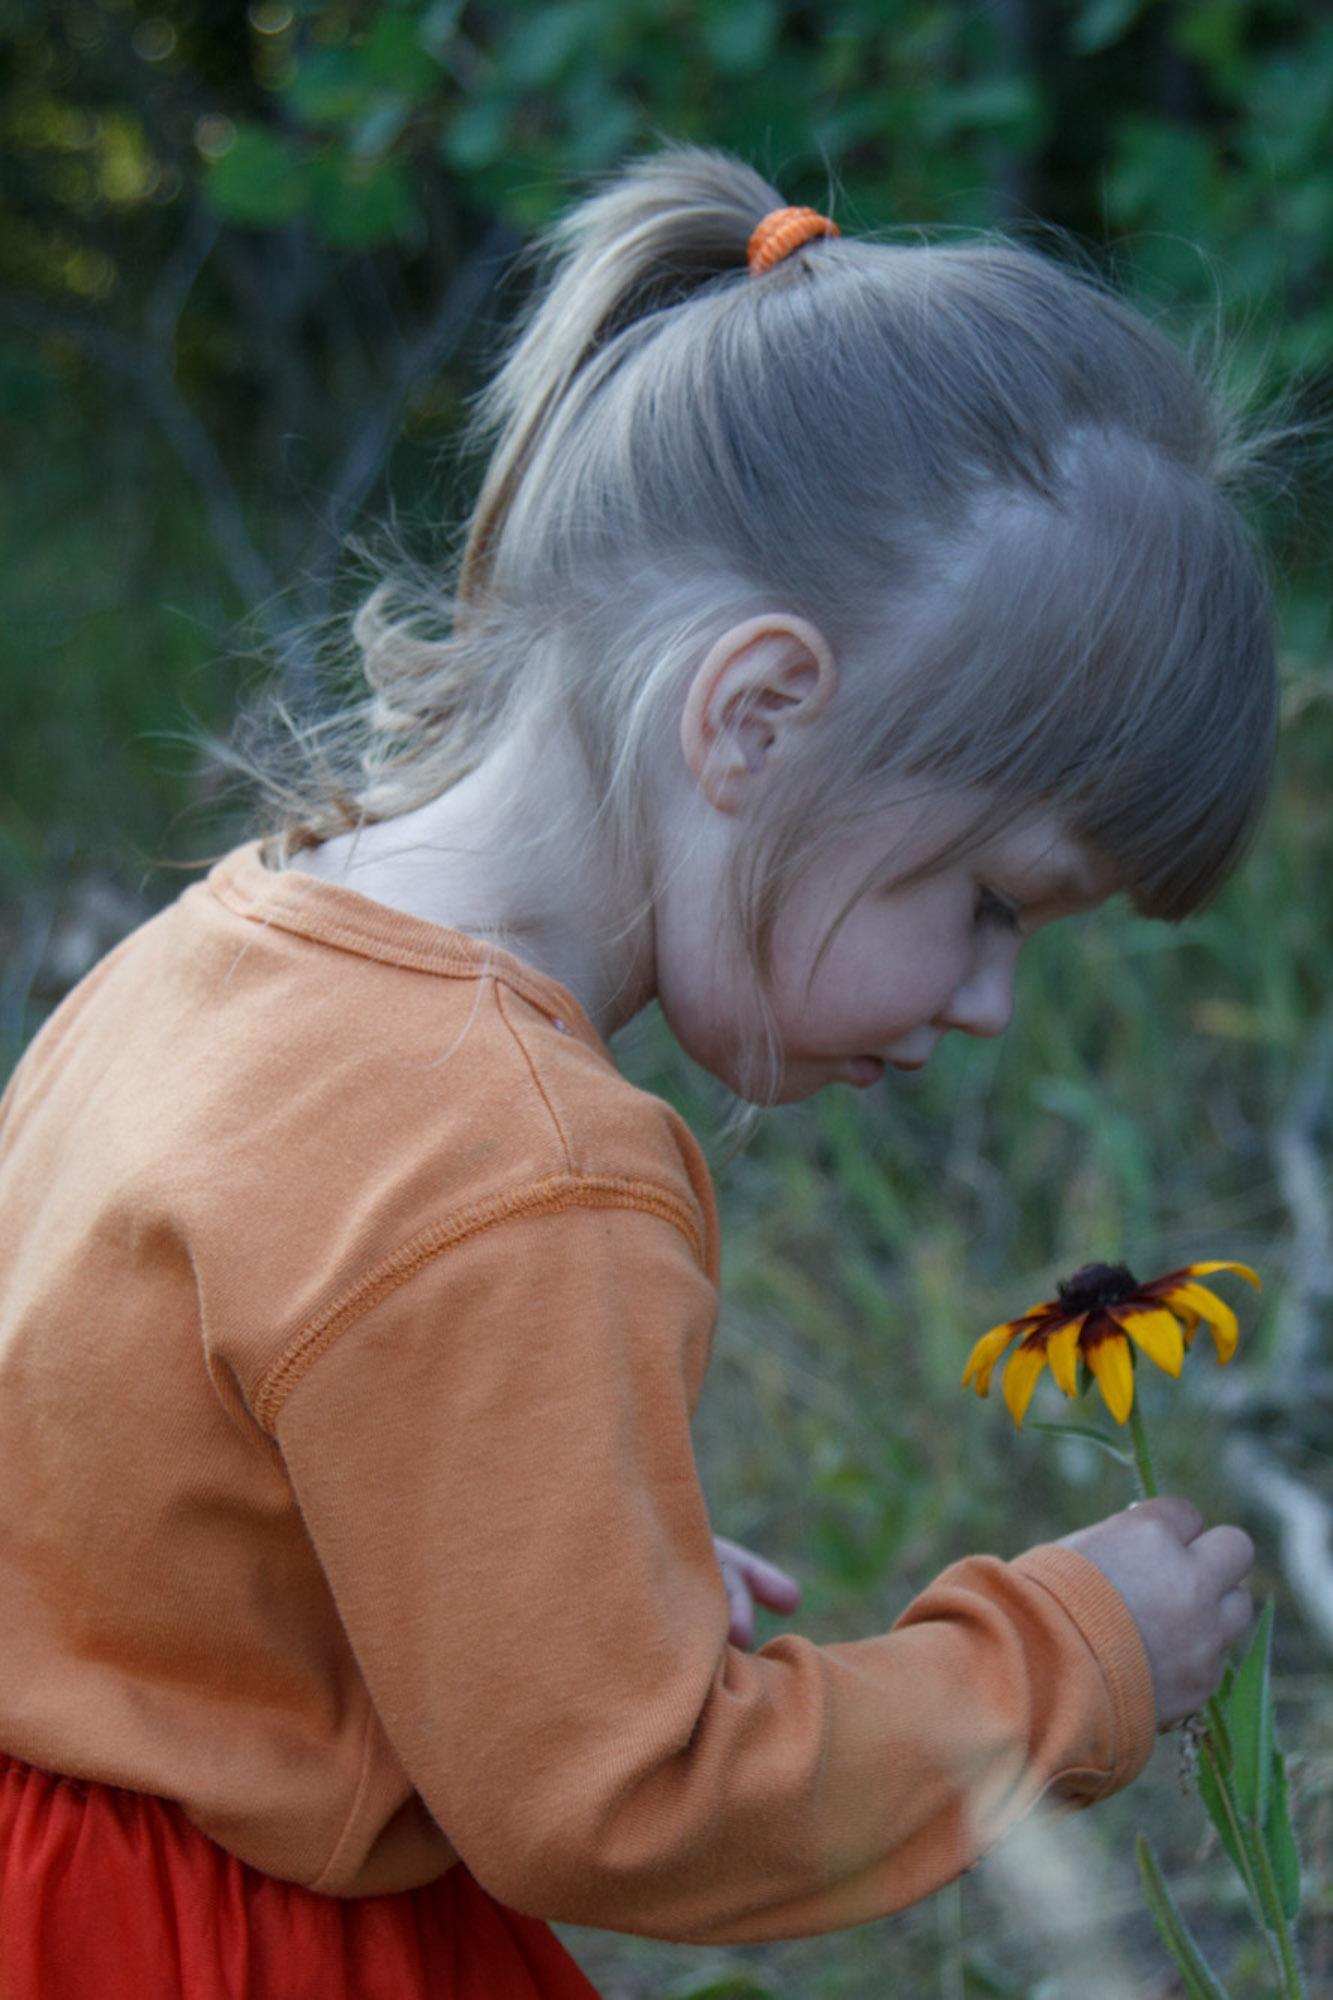 Как воспитывать характер ребенка?